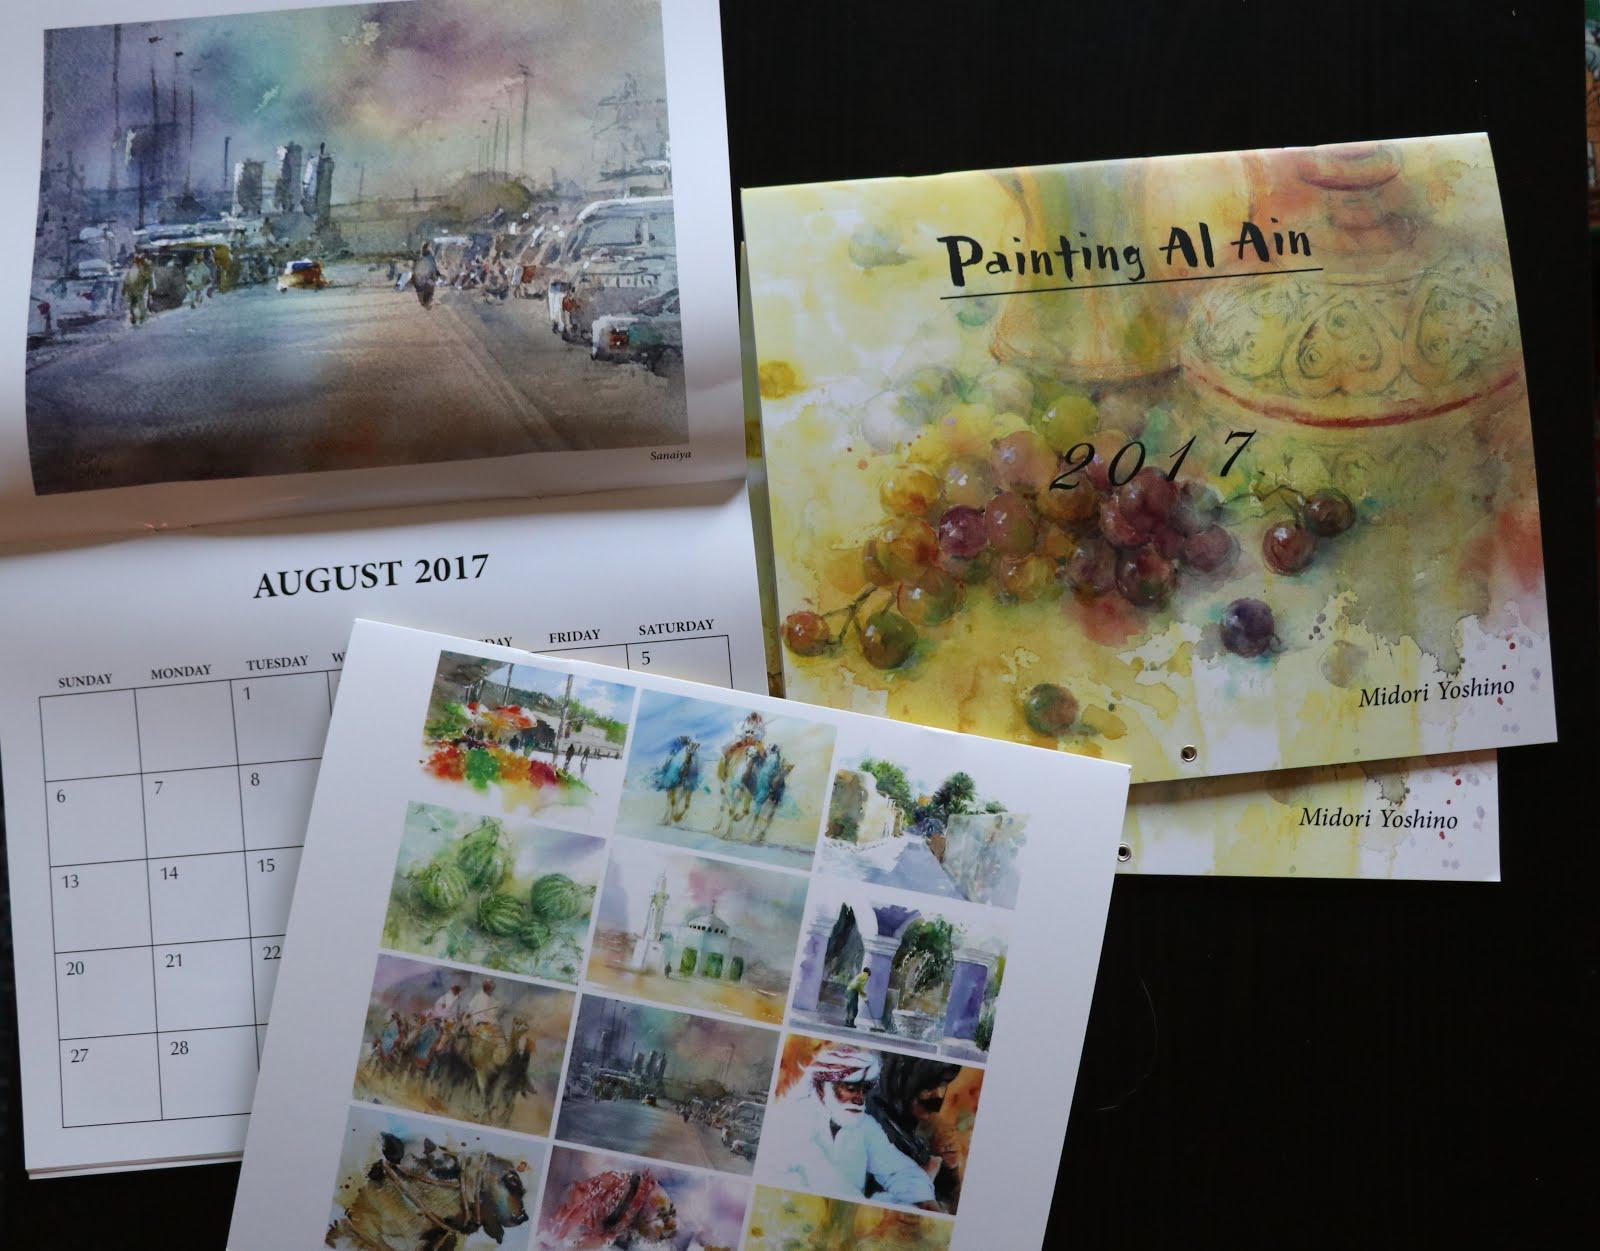 Painting Al Ain 2017 Calandar